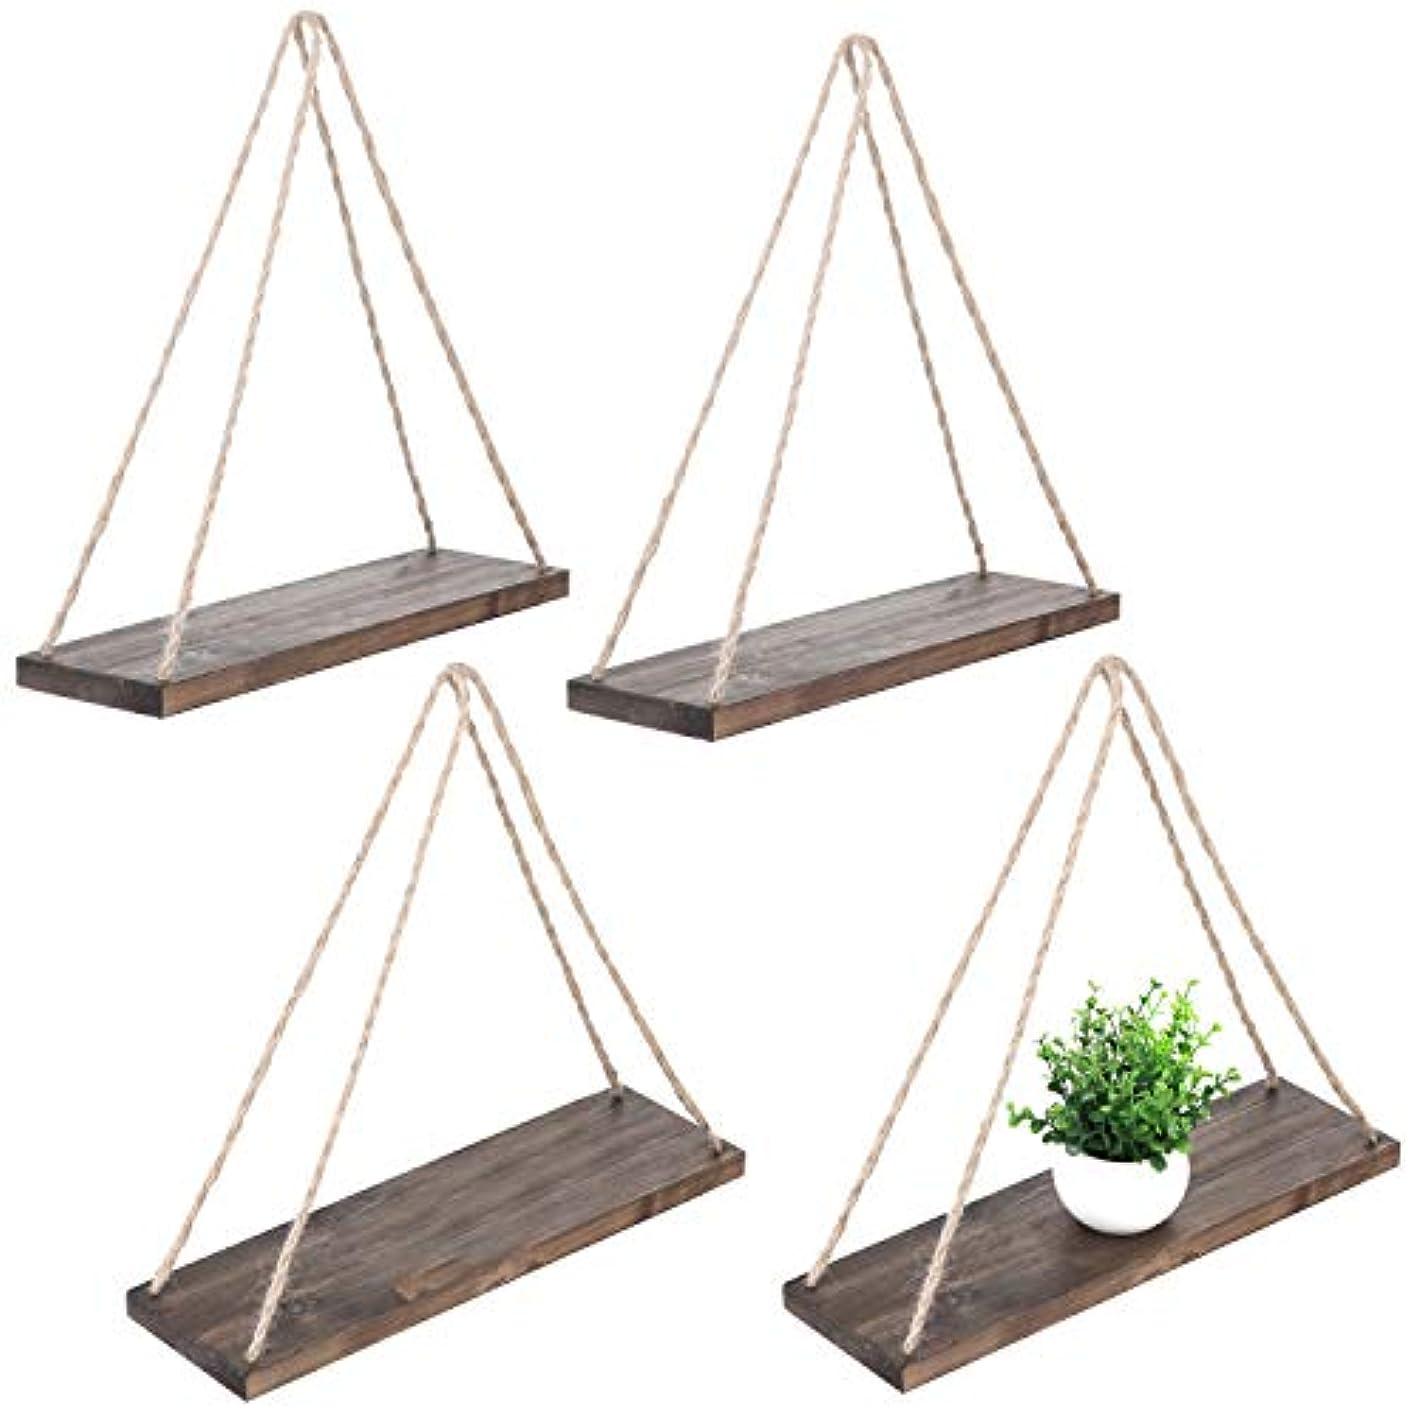 MyGift Set of 4 Rustic Brown Wood Rope-Hanging Swing Wall Shelves